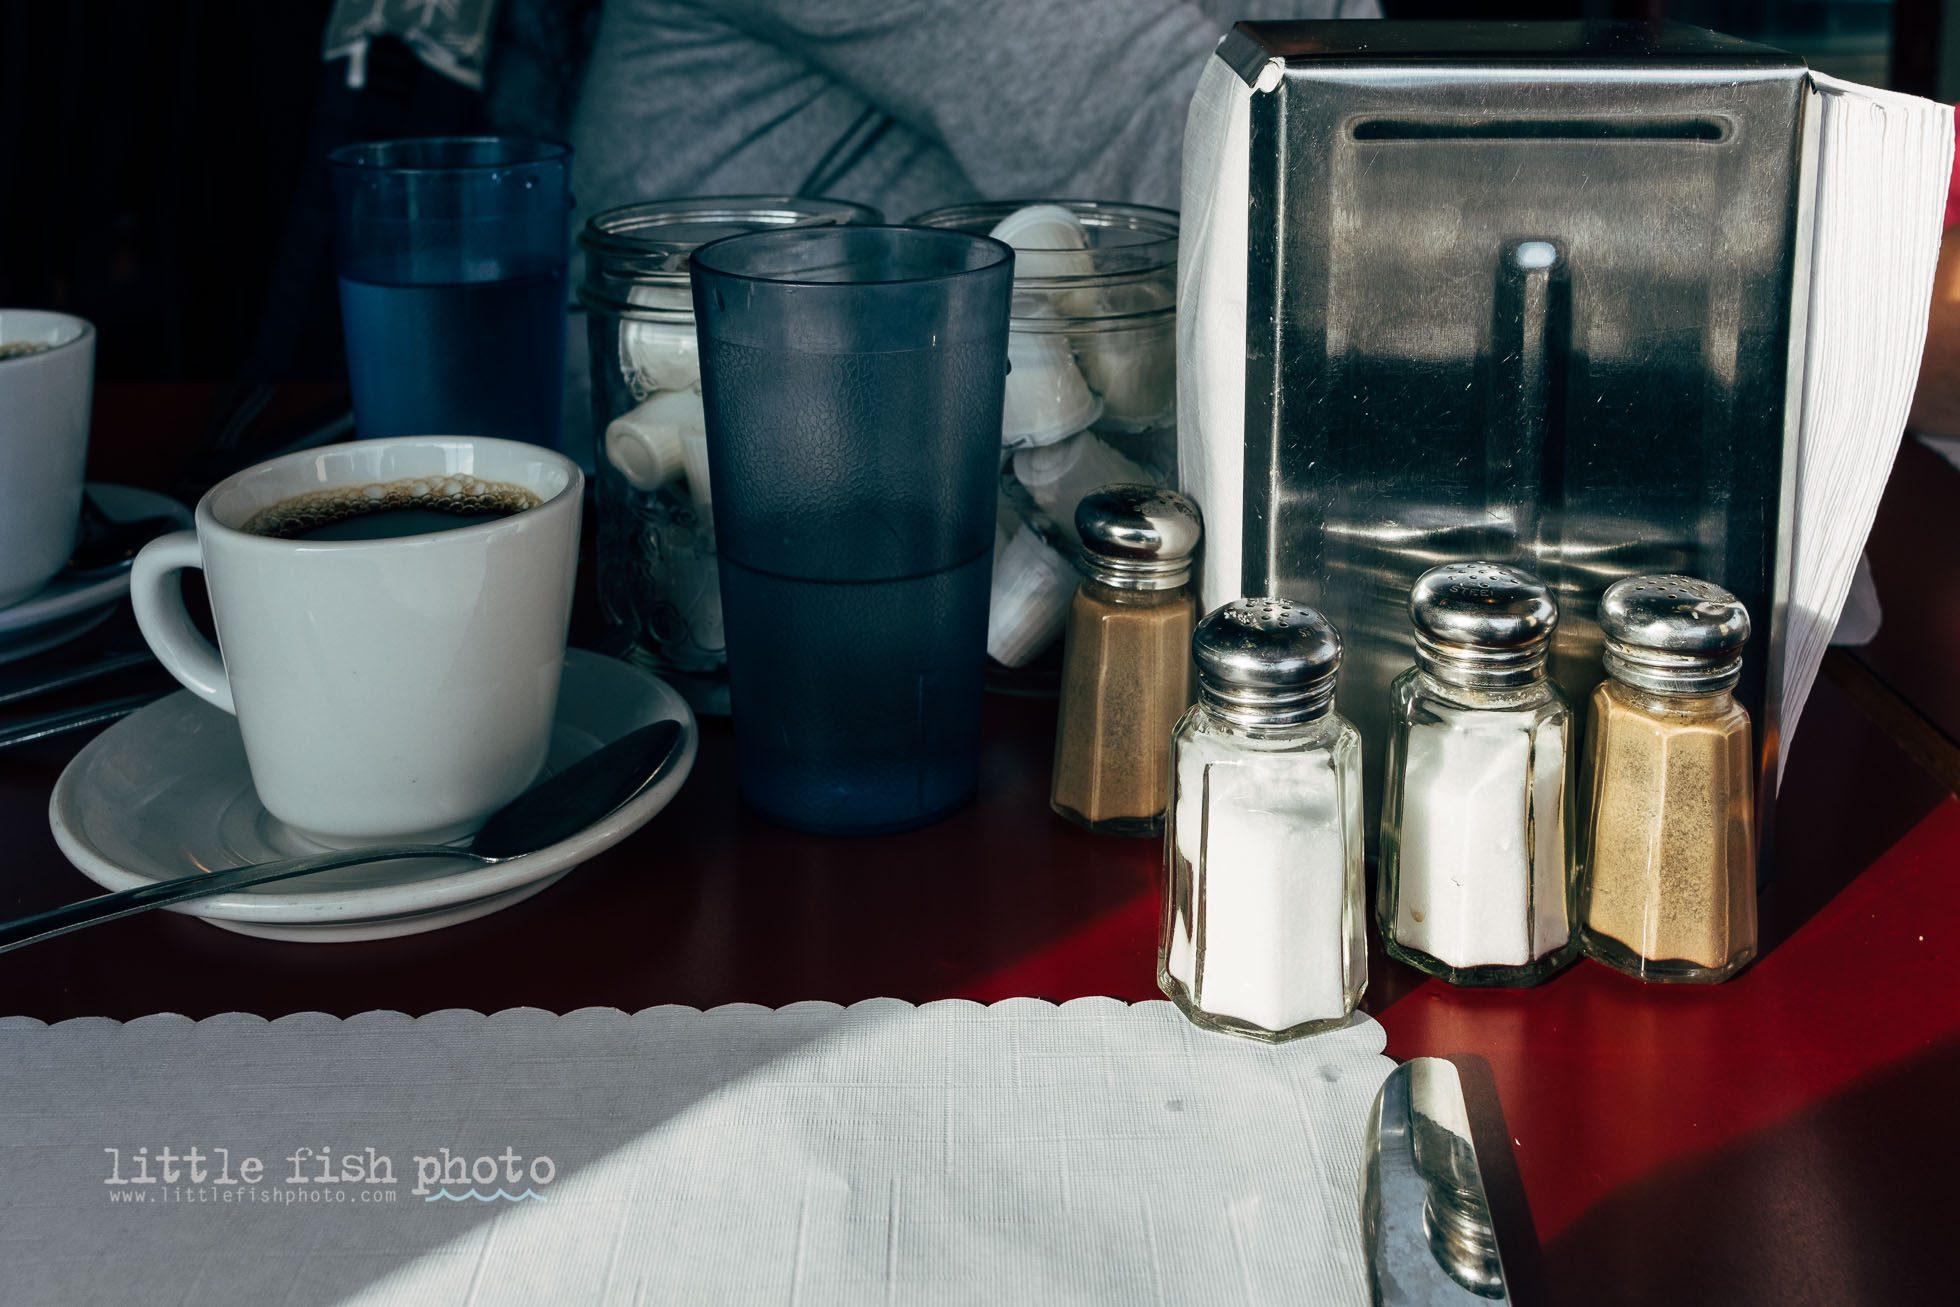 table top scene at brunch